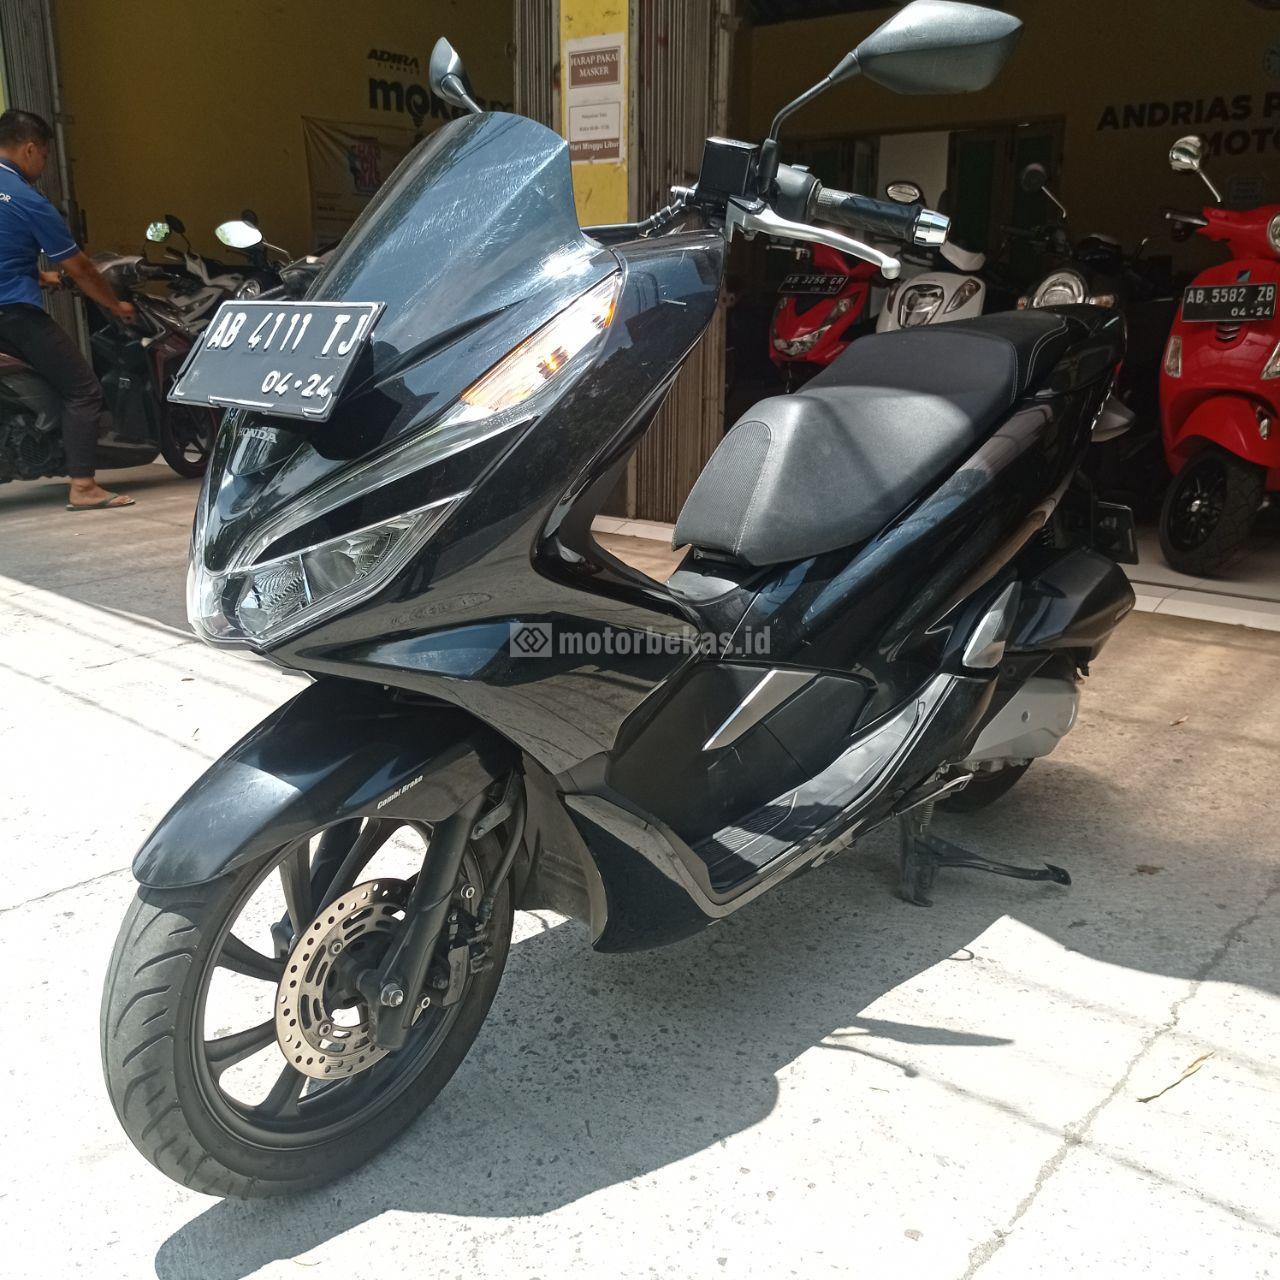 HONDA PCX 150  2019 motorbekas.id